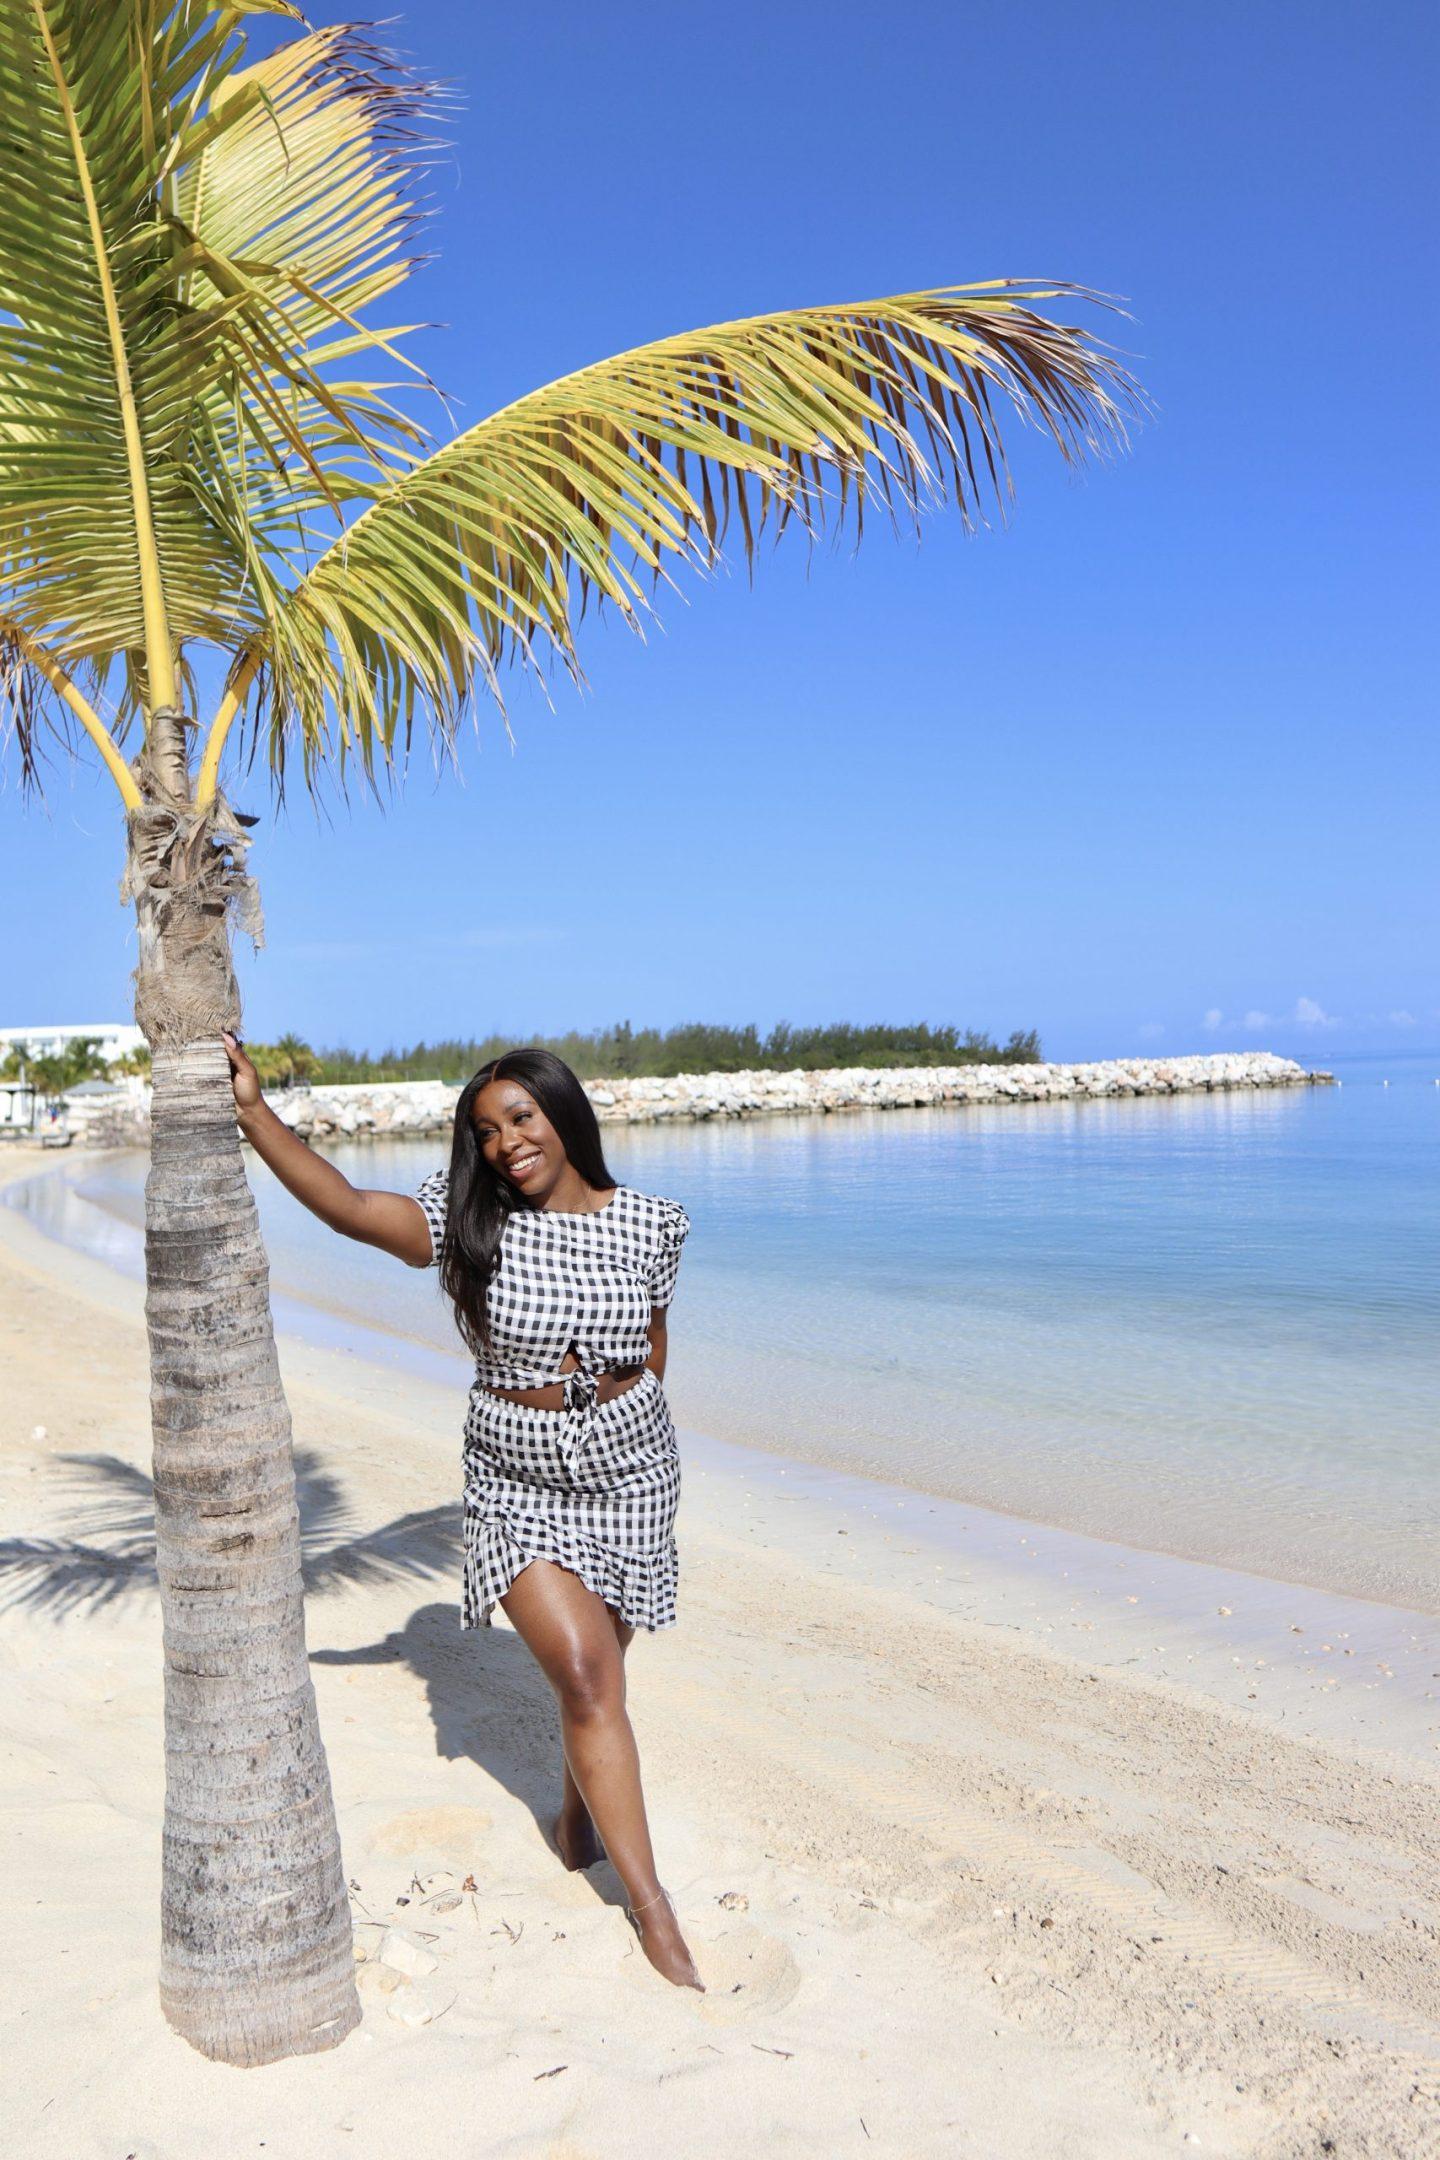 Beach Vacay Essentials-Packing List